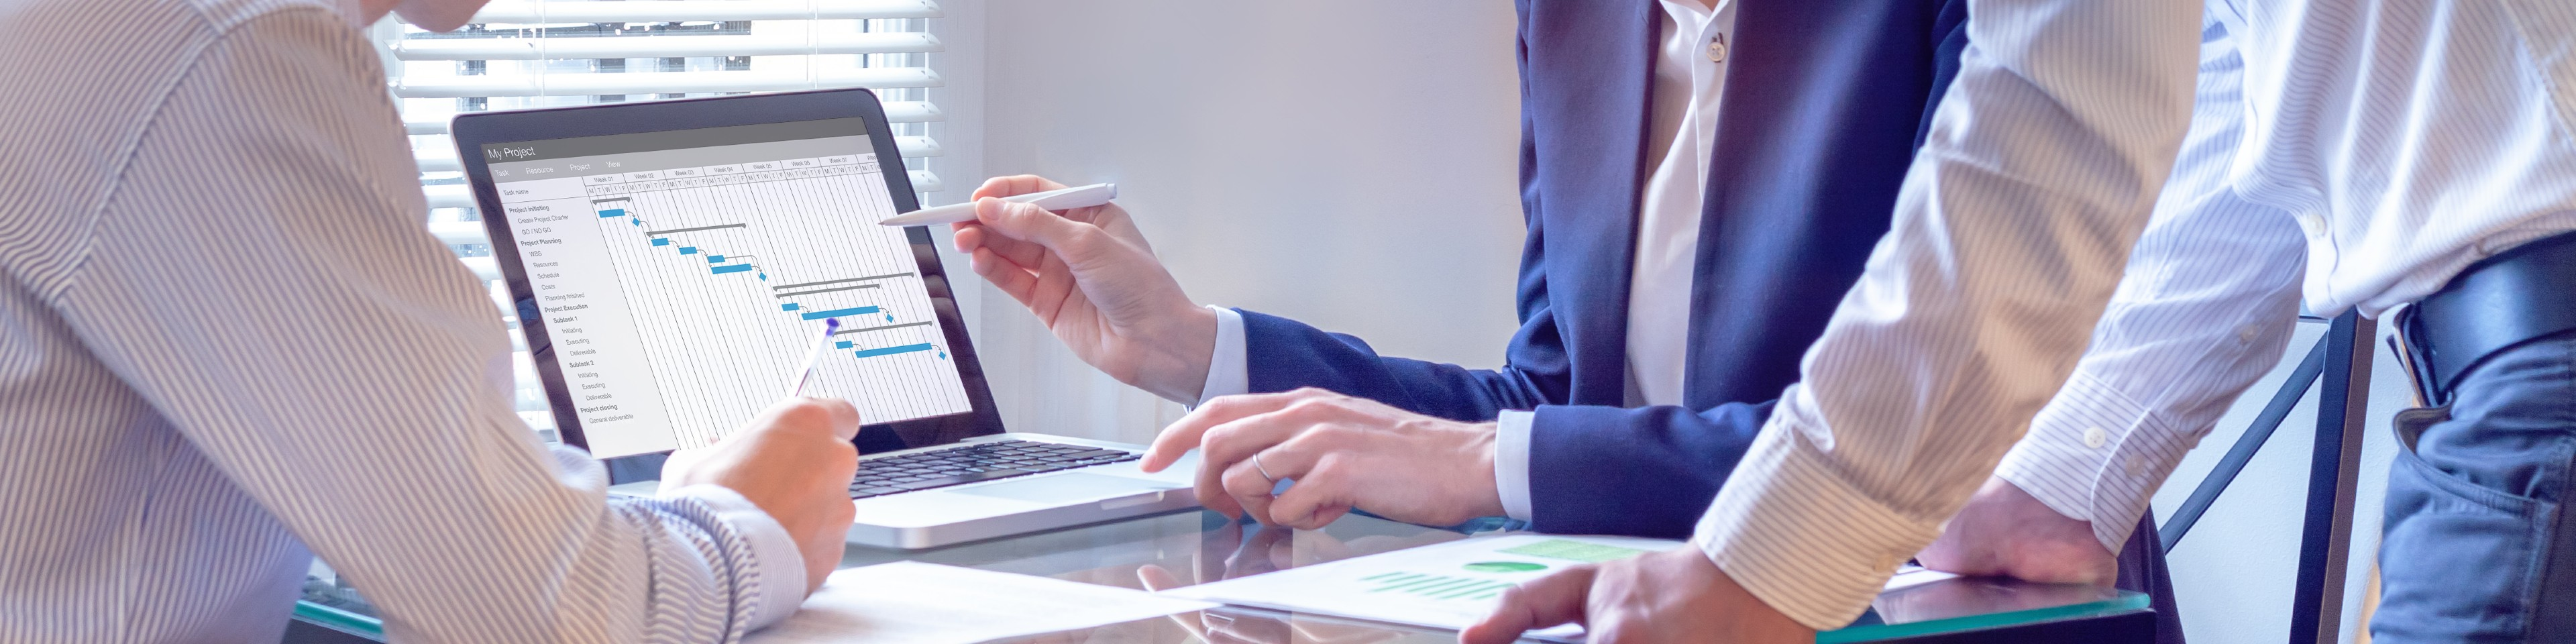 4 Parole su Genya CFO